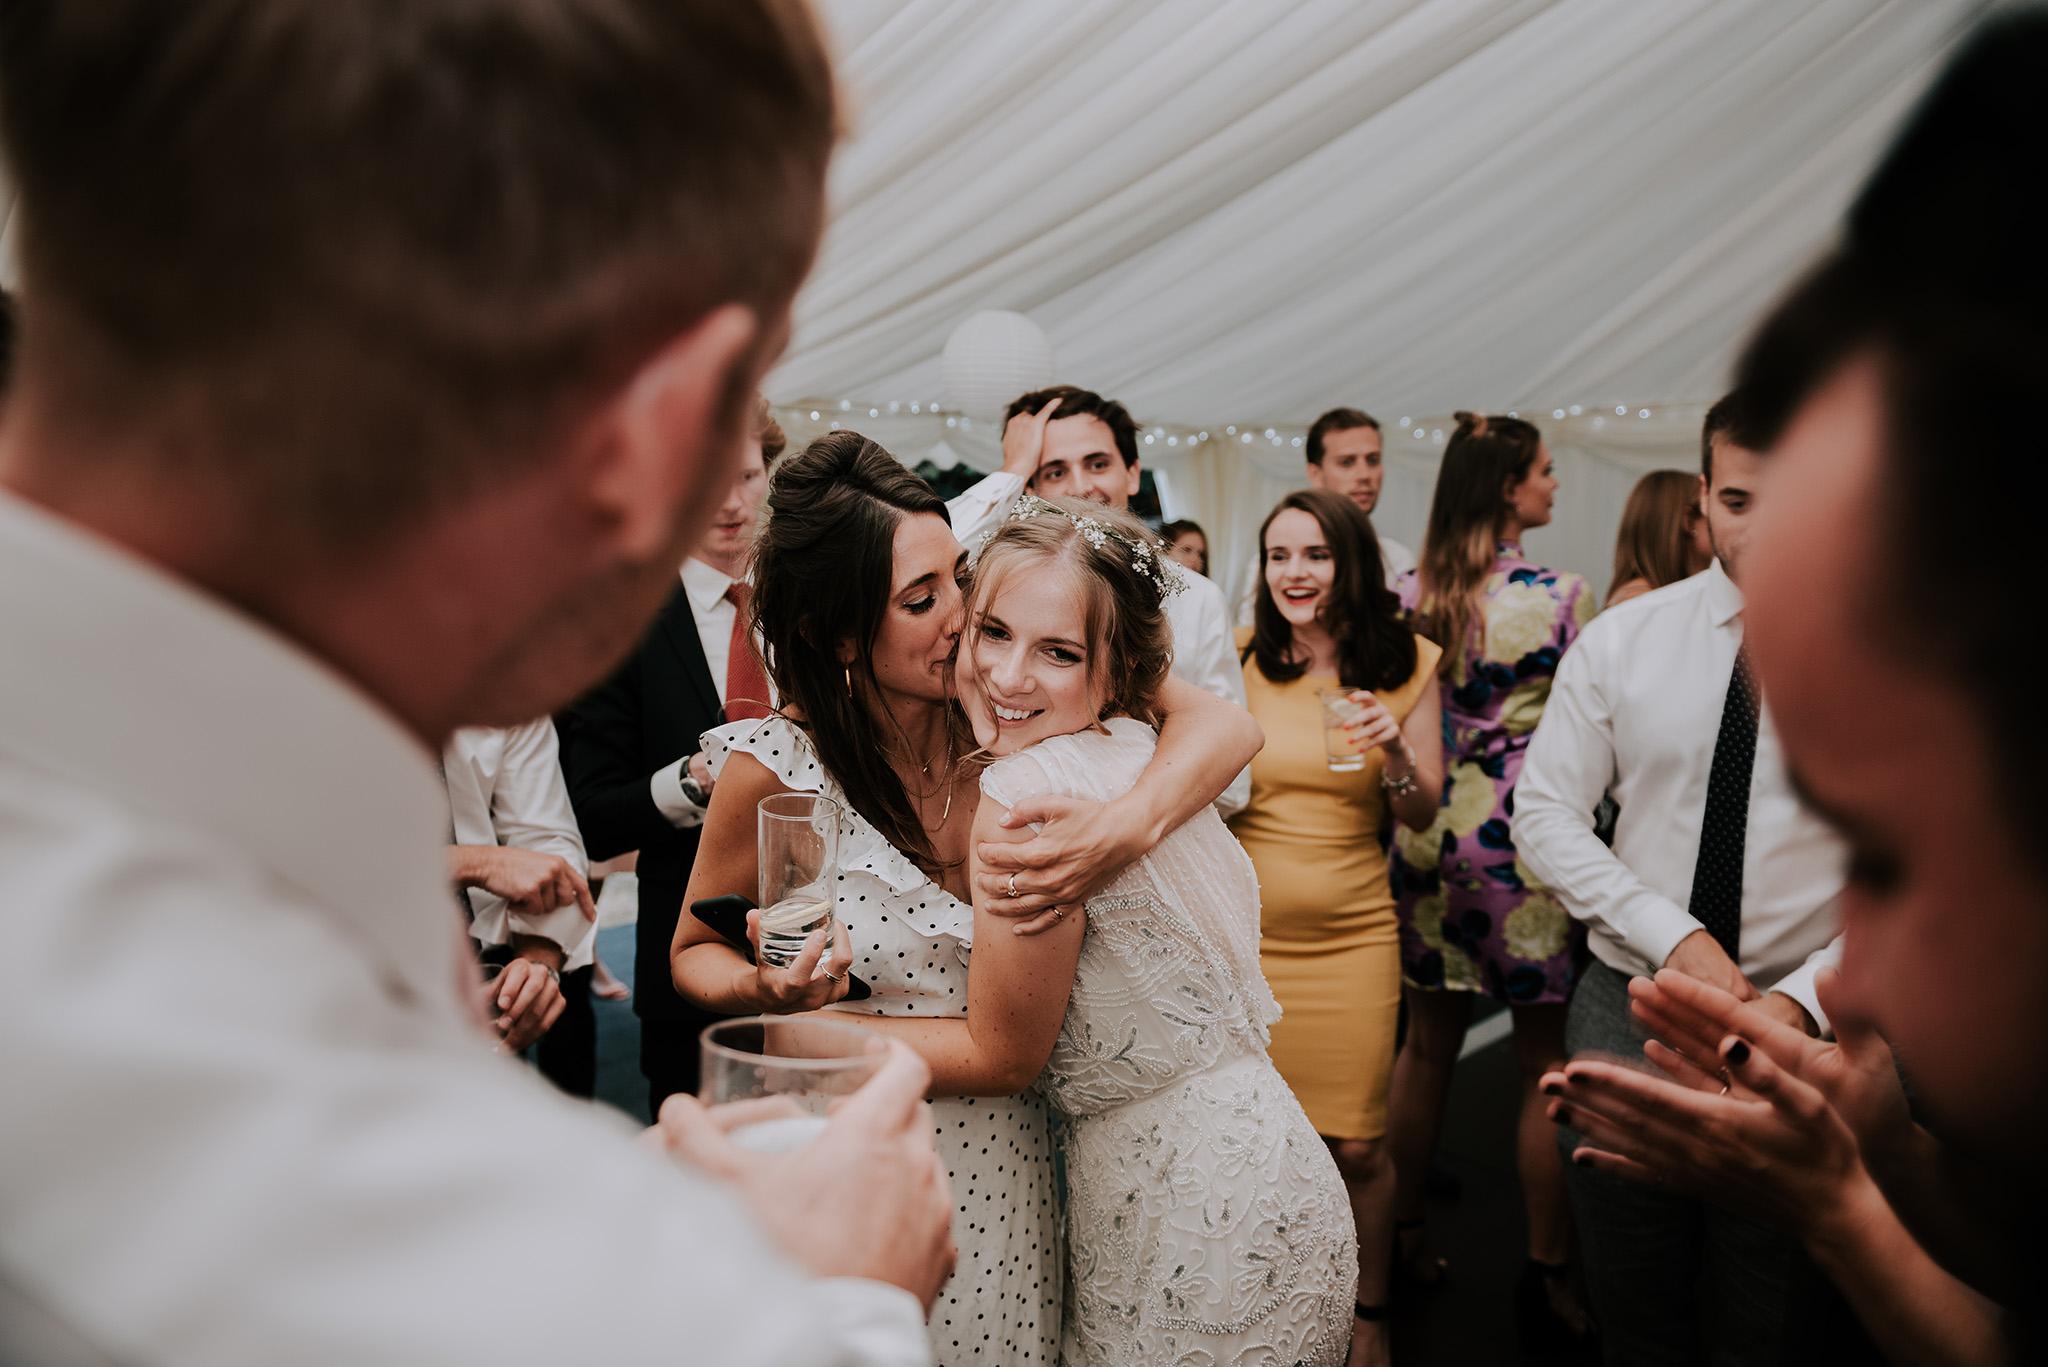 scott-stockwell-photography-wedding-34.jpg